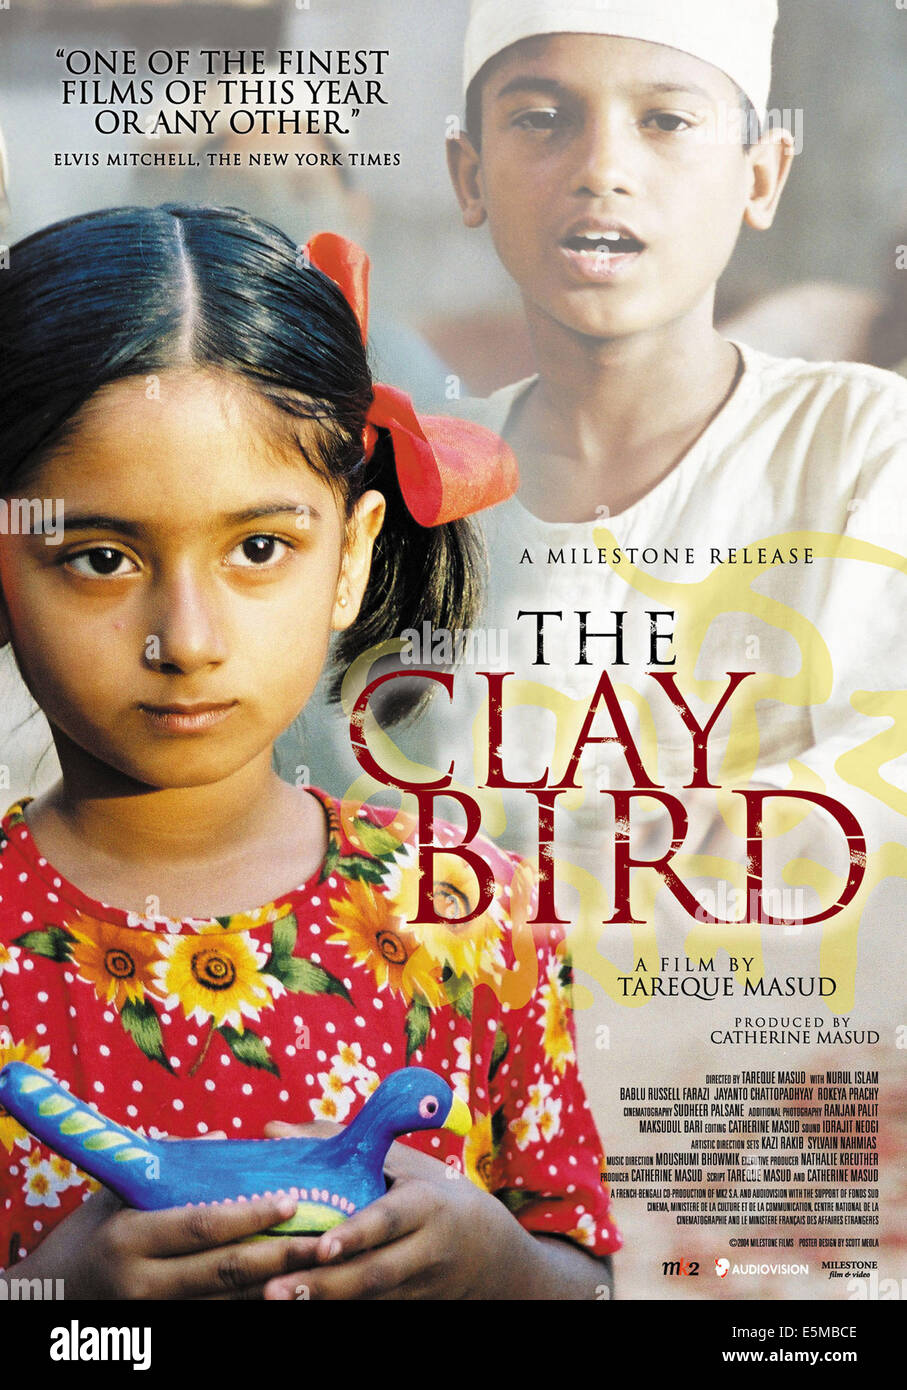 THE CLAY BIRD, (aka MATIR MOINA), Lameesa R. Reemjheem, Nurul Islam Bablu, 2002, (c) Milestone/courtesy Everett - Stock Image